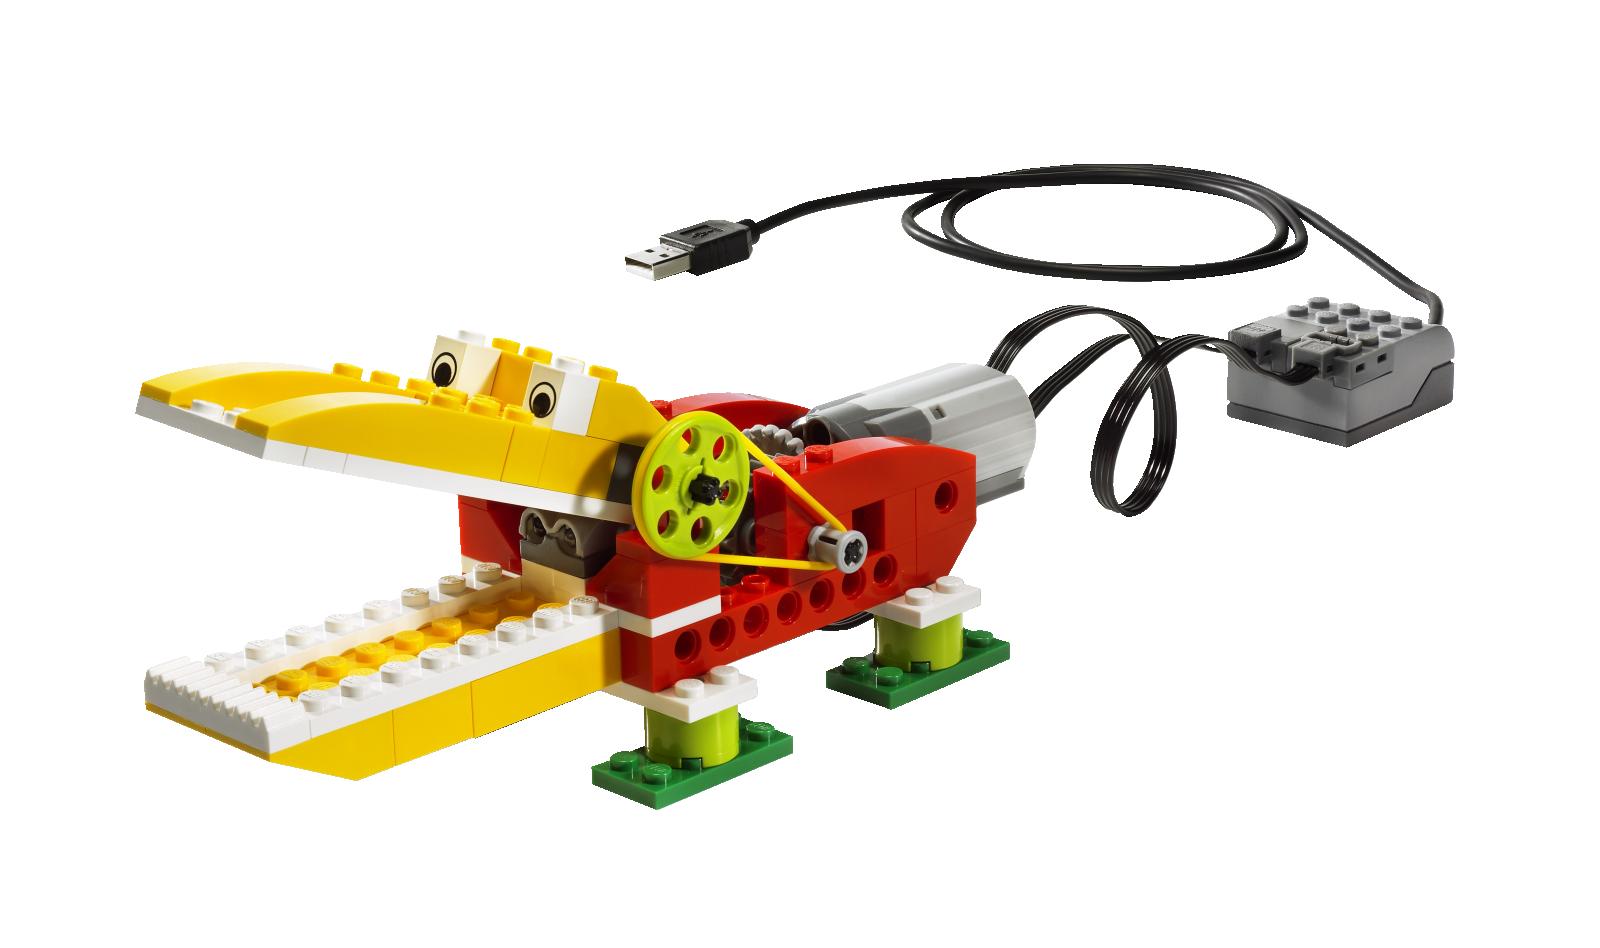 Legos clipart robotics lego. Images of robot spacehero